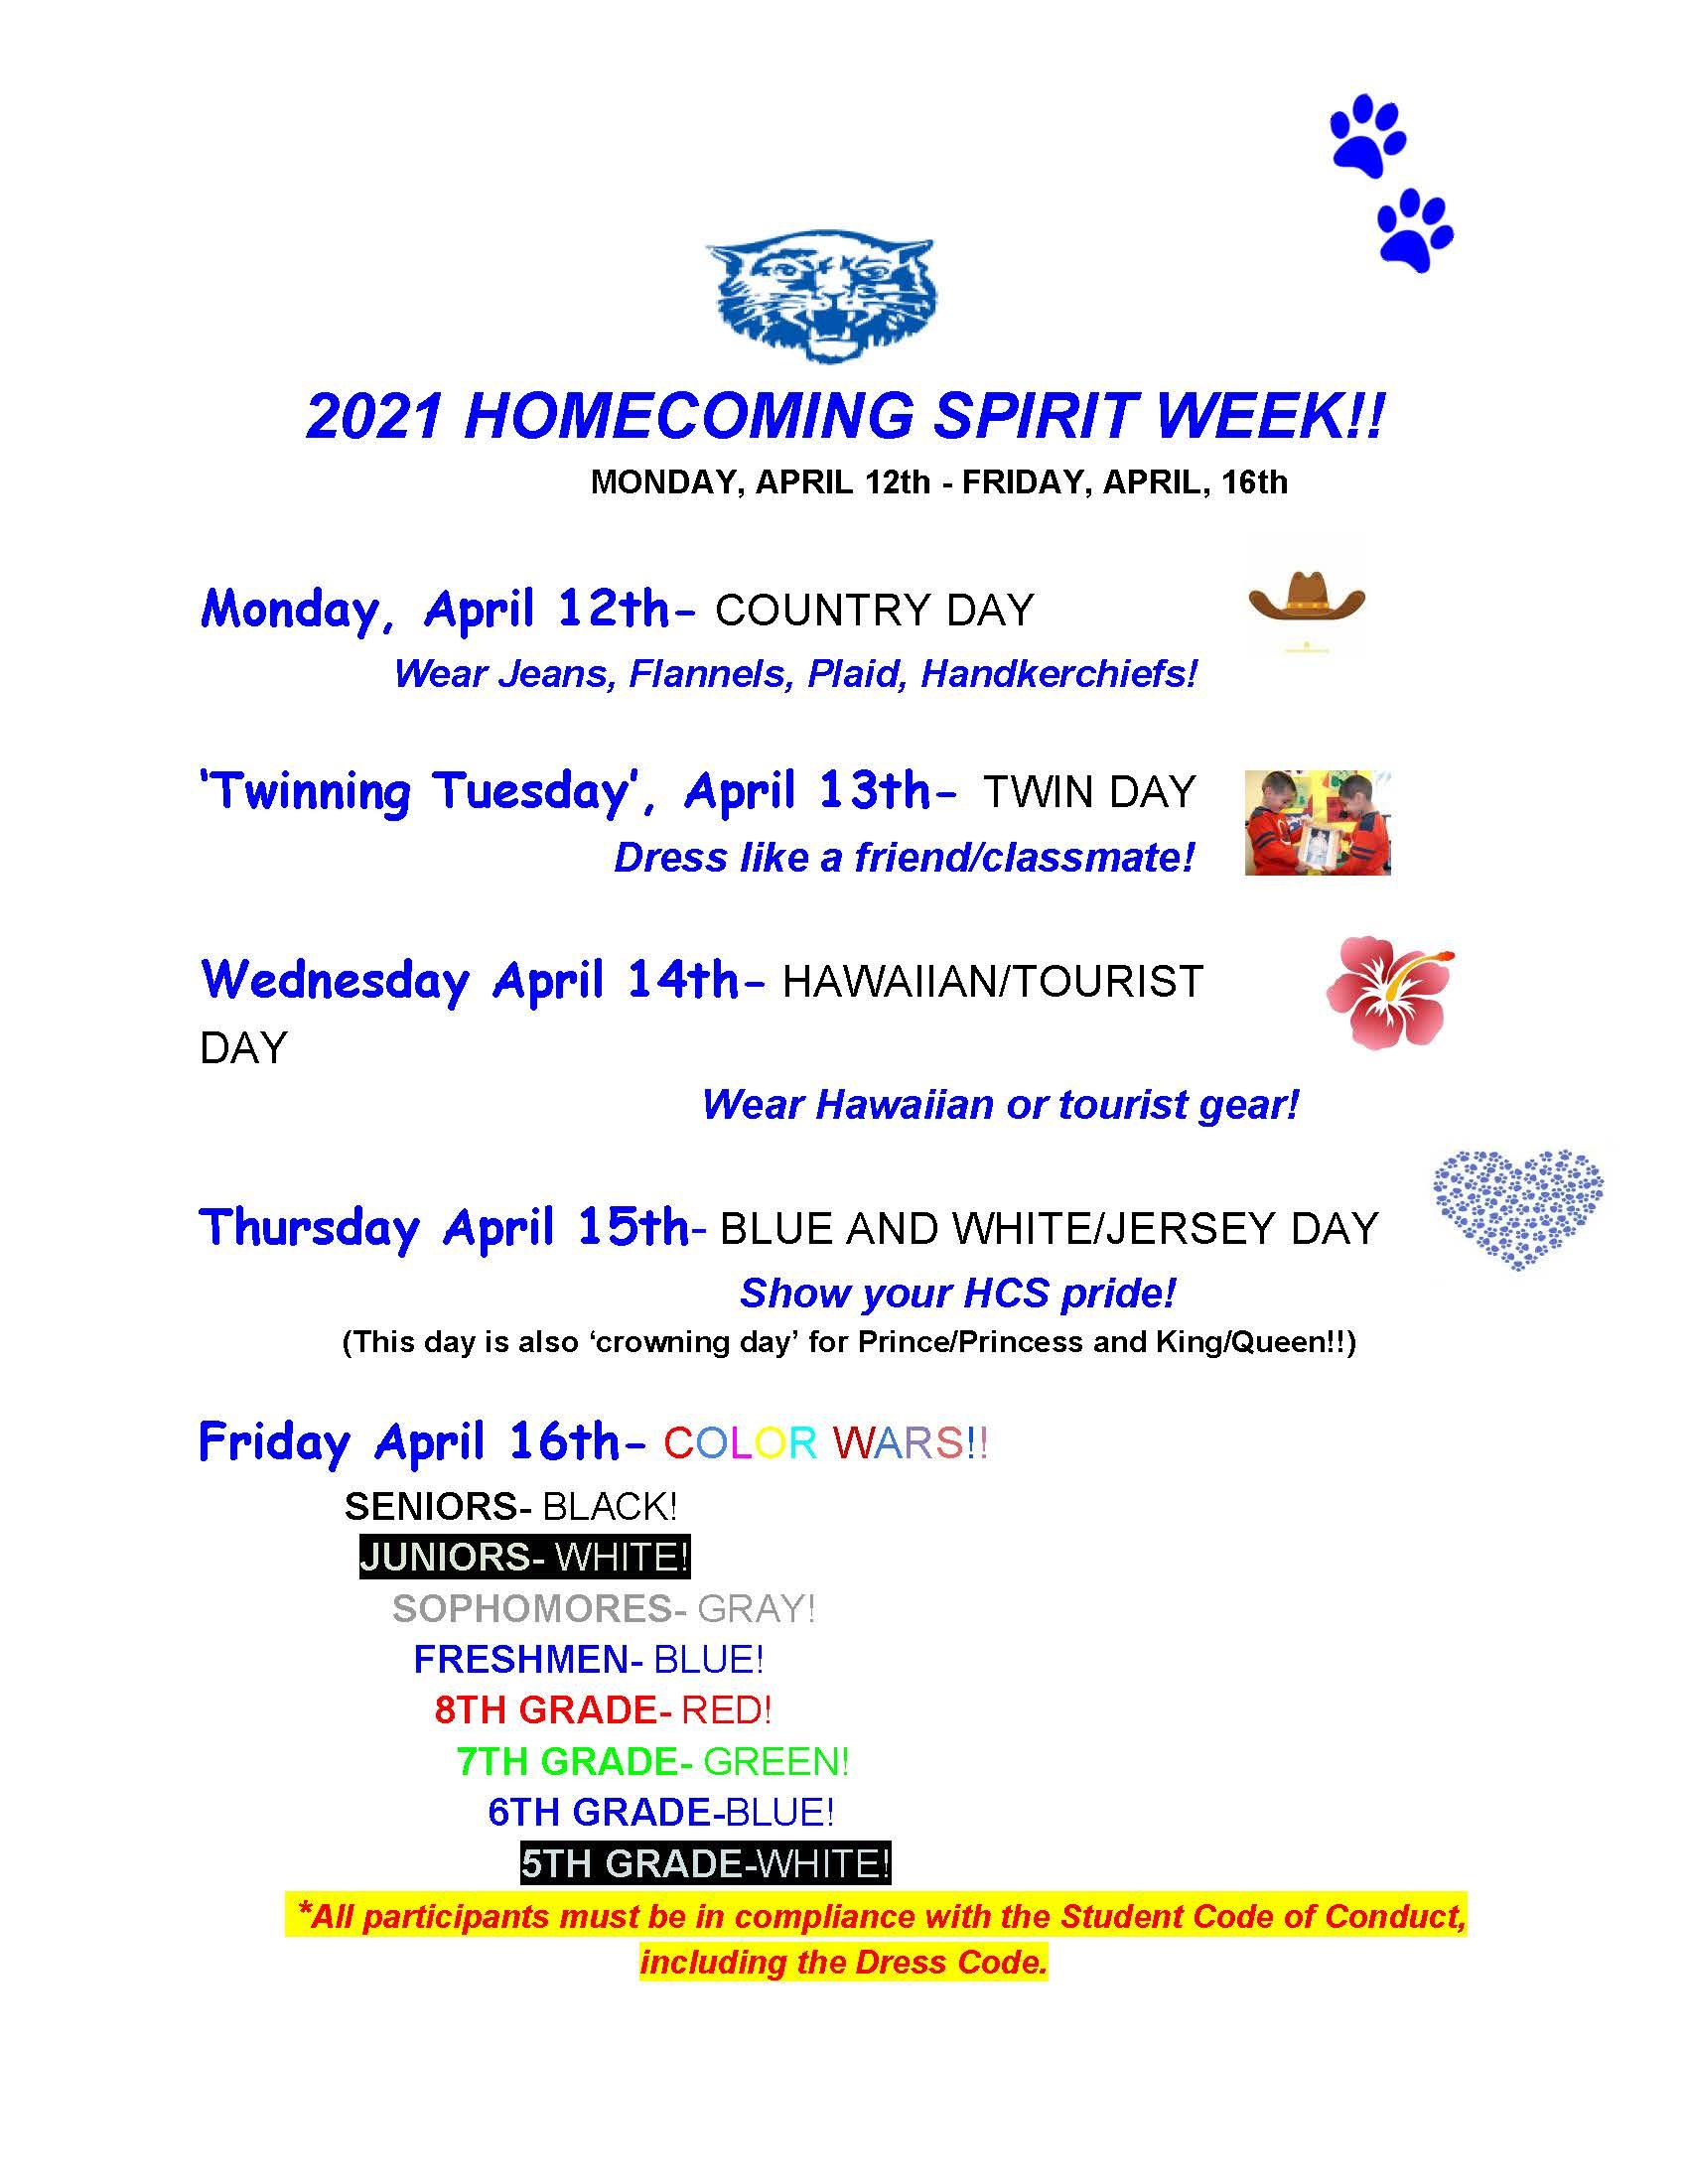 2021 HCS Homecoming Spirit Week Schedule